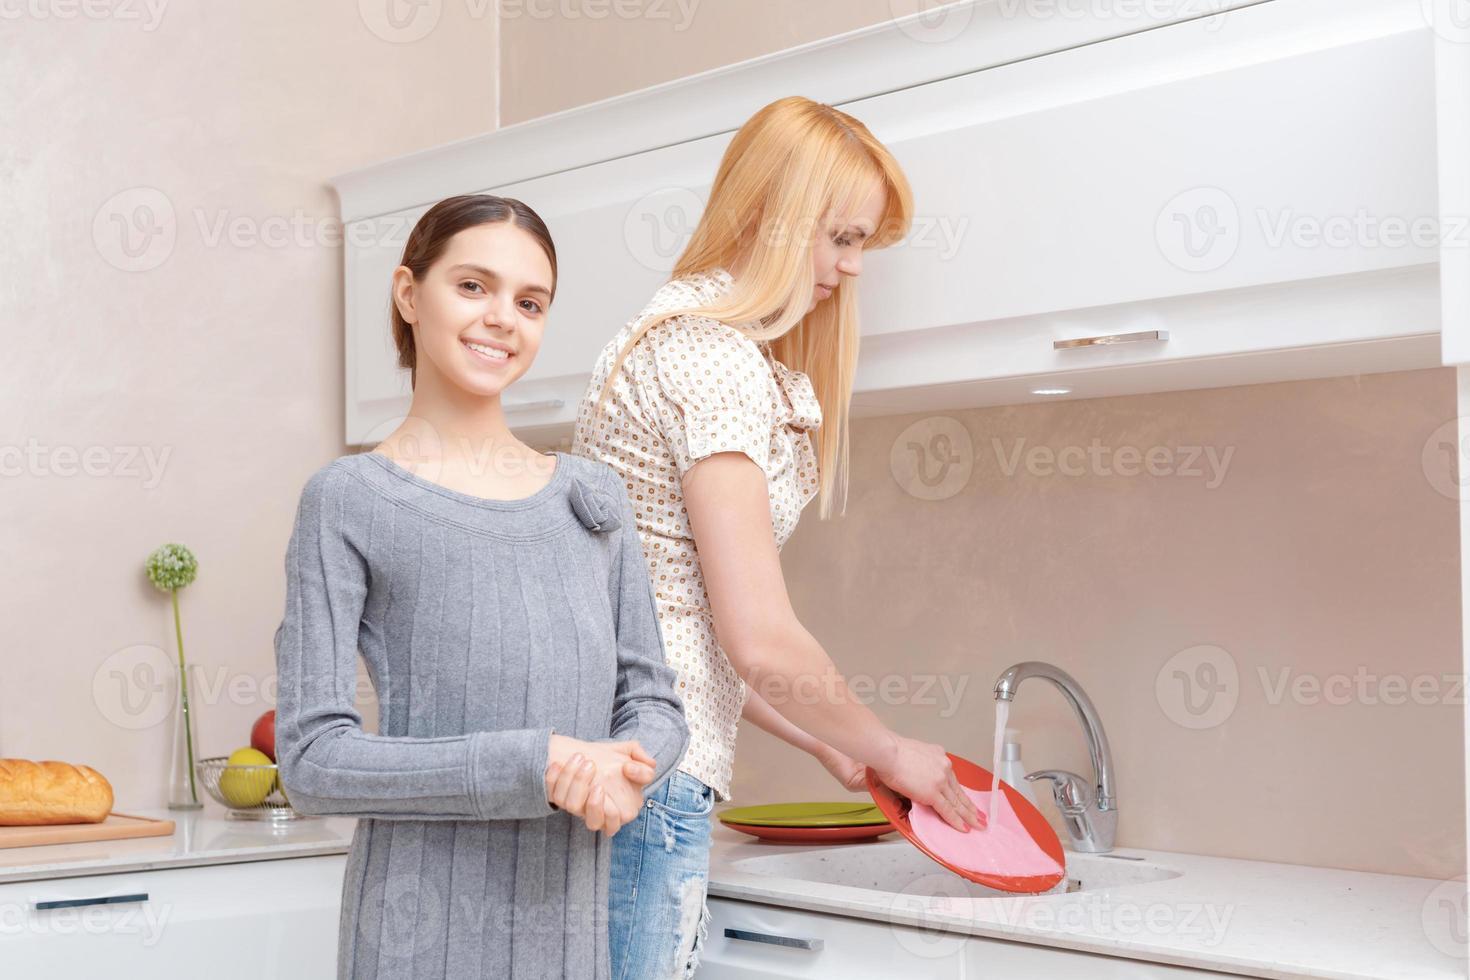 madre e hija lavando platos foto